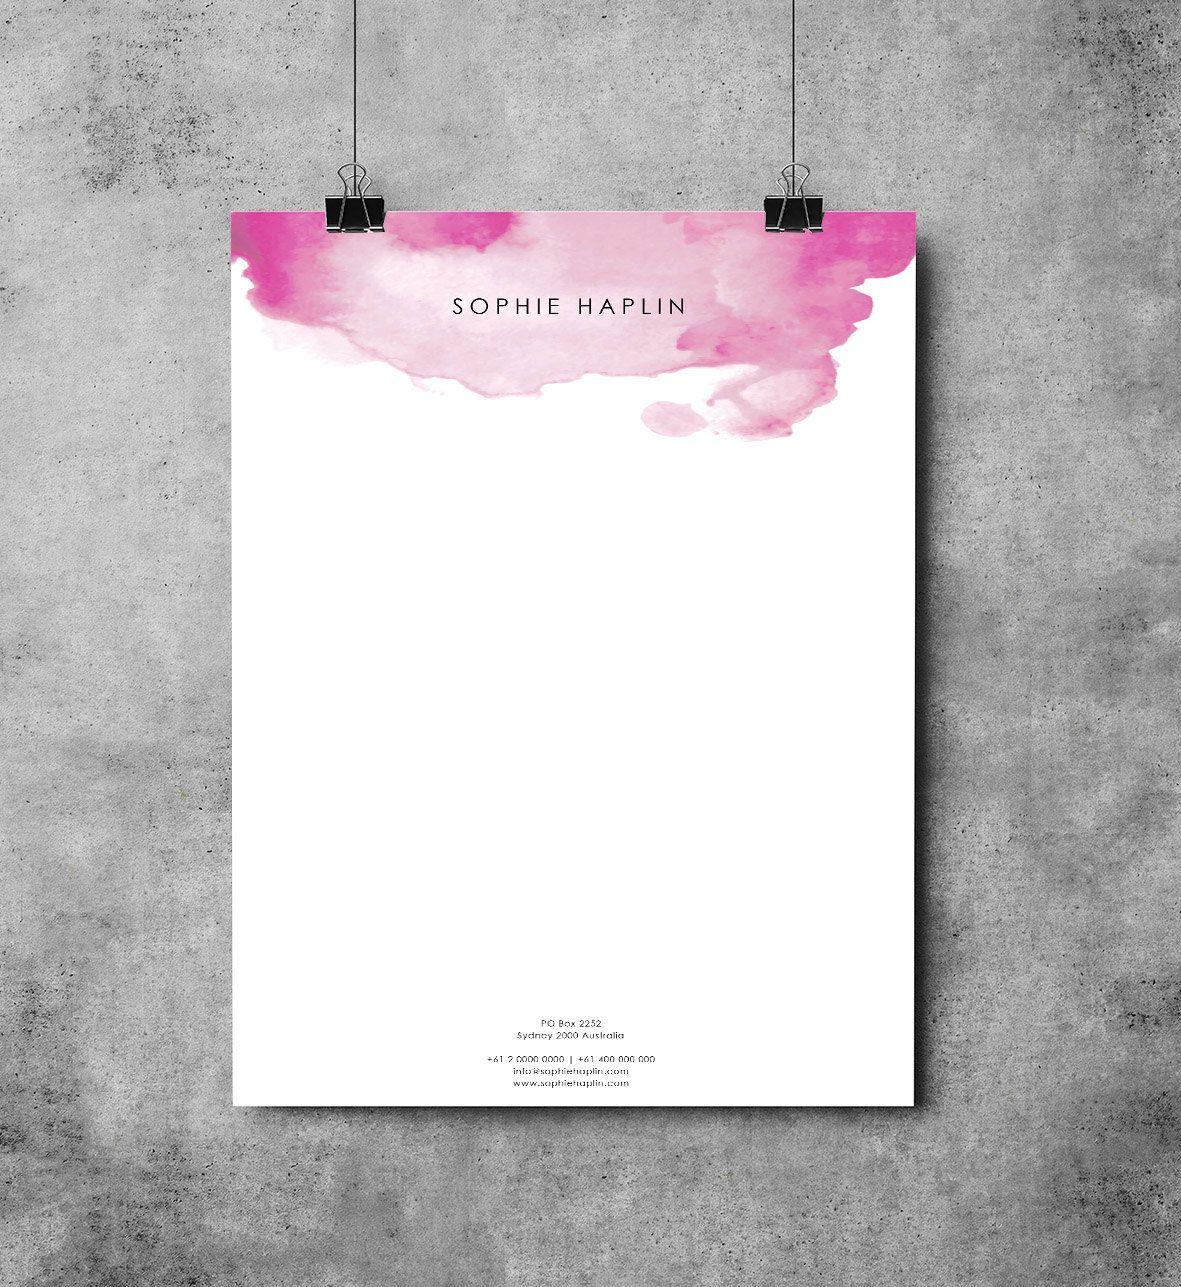 word 2007 letterhead template